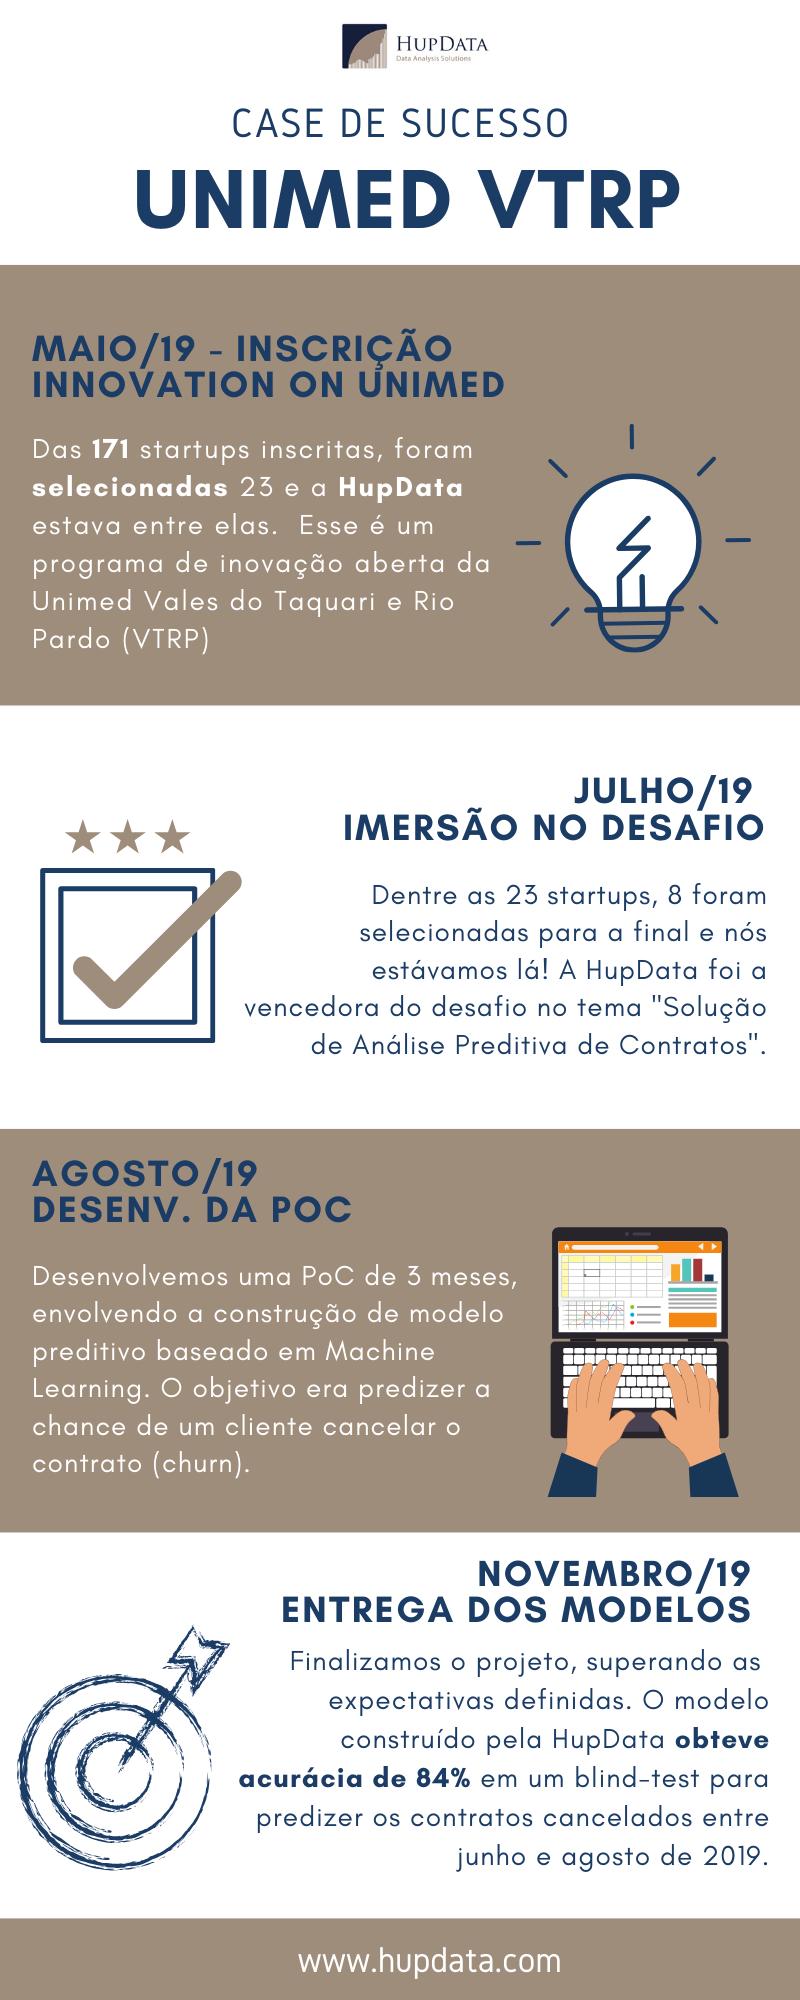 infográfico case unimed vtpr